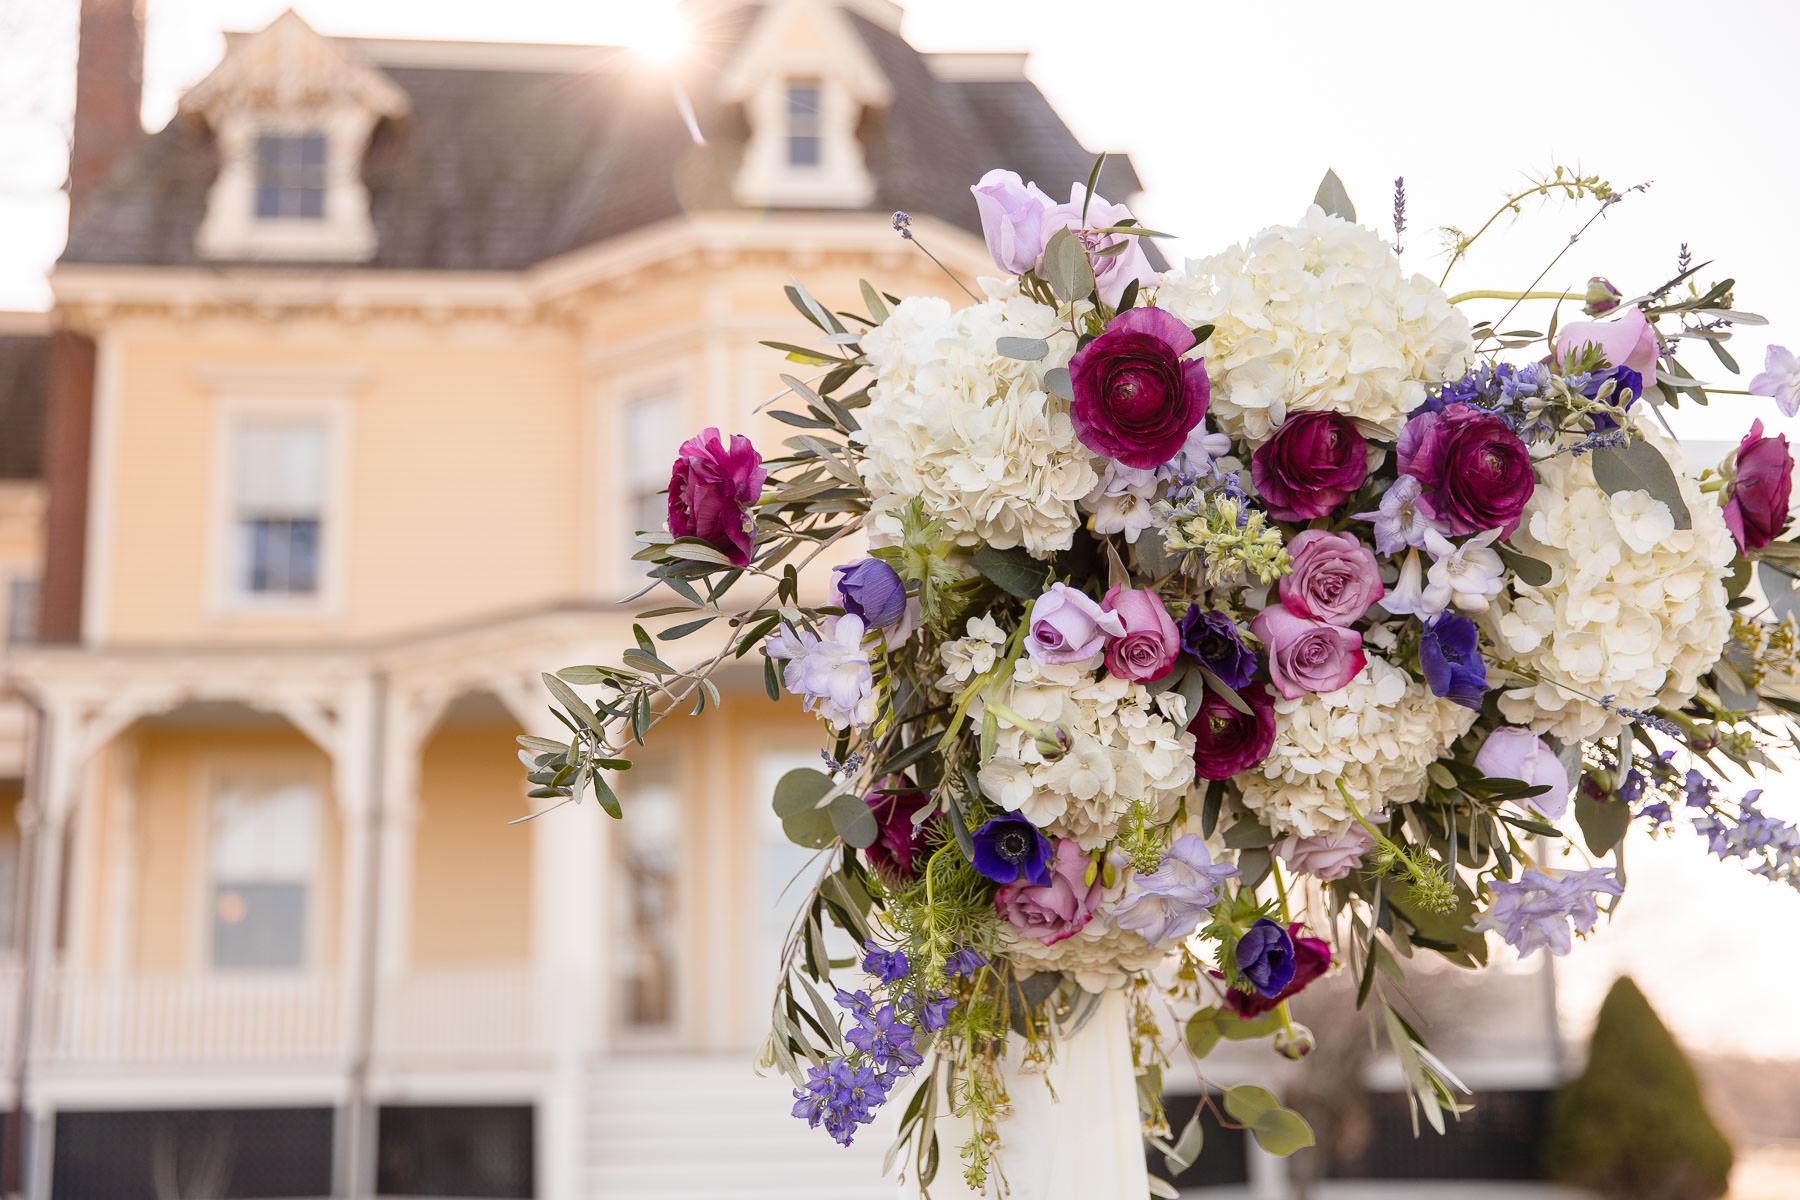 Eisenhower House, Newport, Rhode Island, Tracy Jenkins Photography, wedding, LGBTQ+, LGBT, Gay, Inclusive, Photography, Wedding photography, flowers, bouquet, arch, ceremony